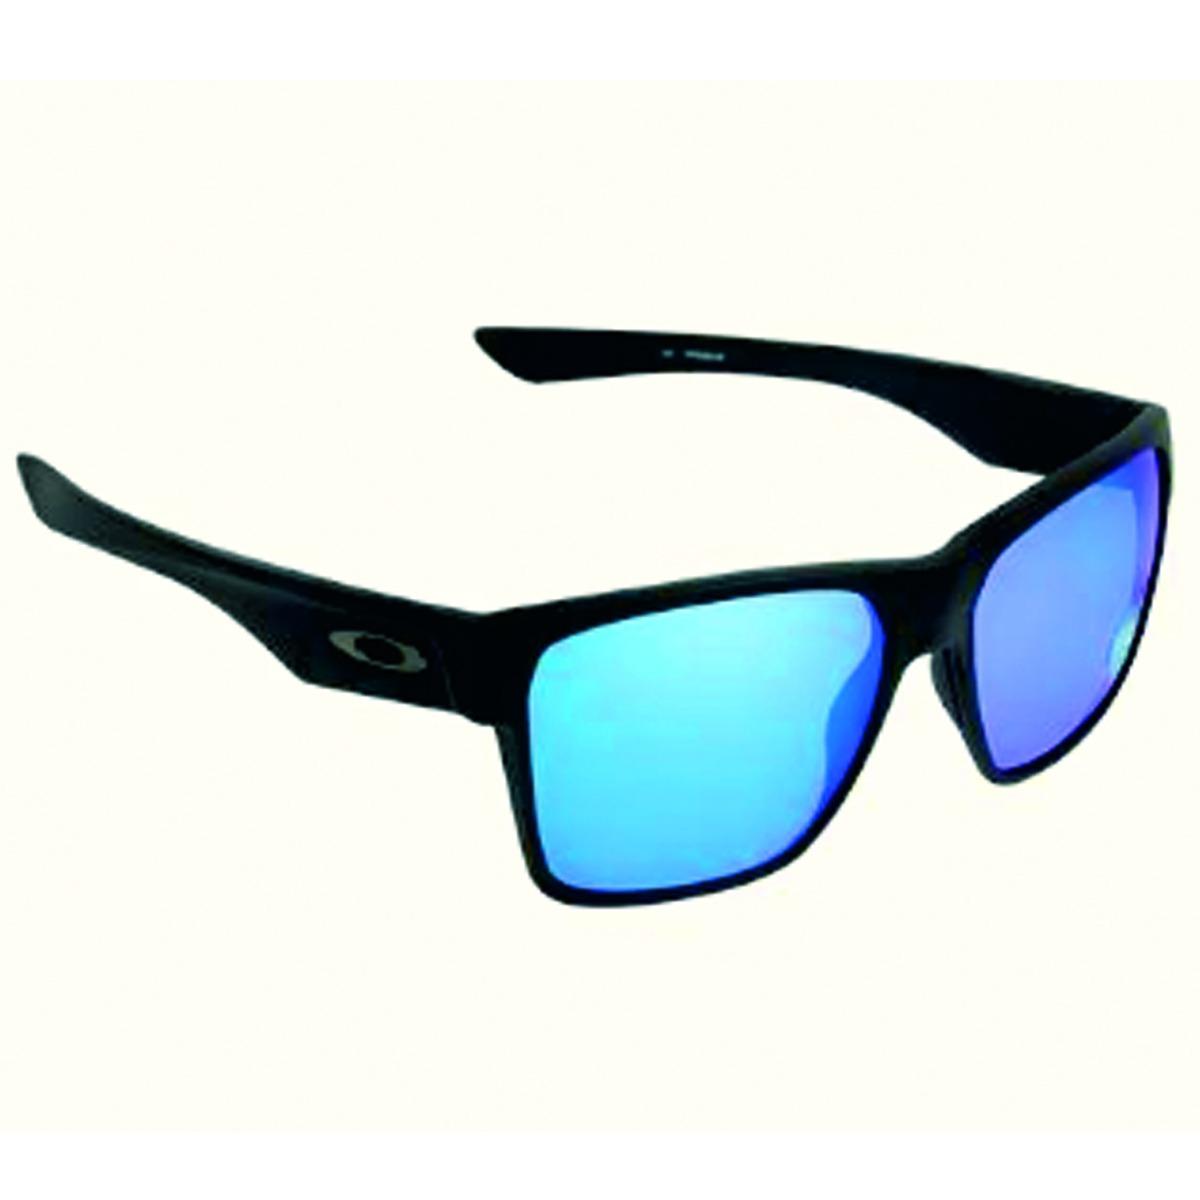 ab8e1f9a43854 oculos oakley twoface xl oo9350-05 matte black polarized. Carregando zoom.